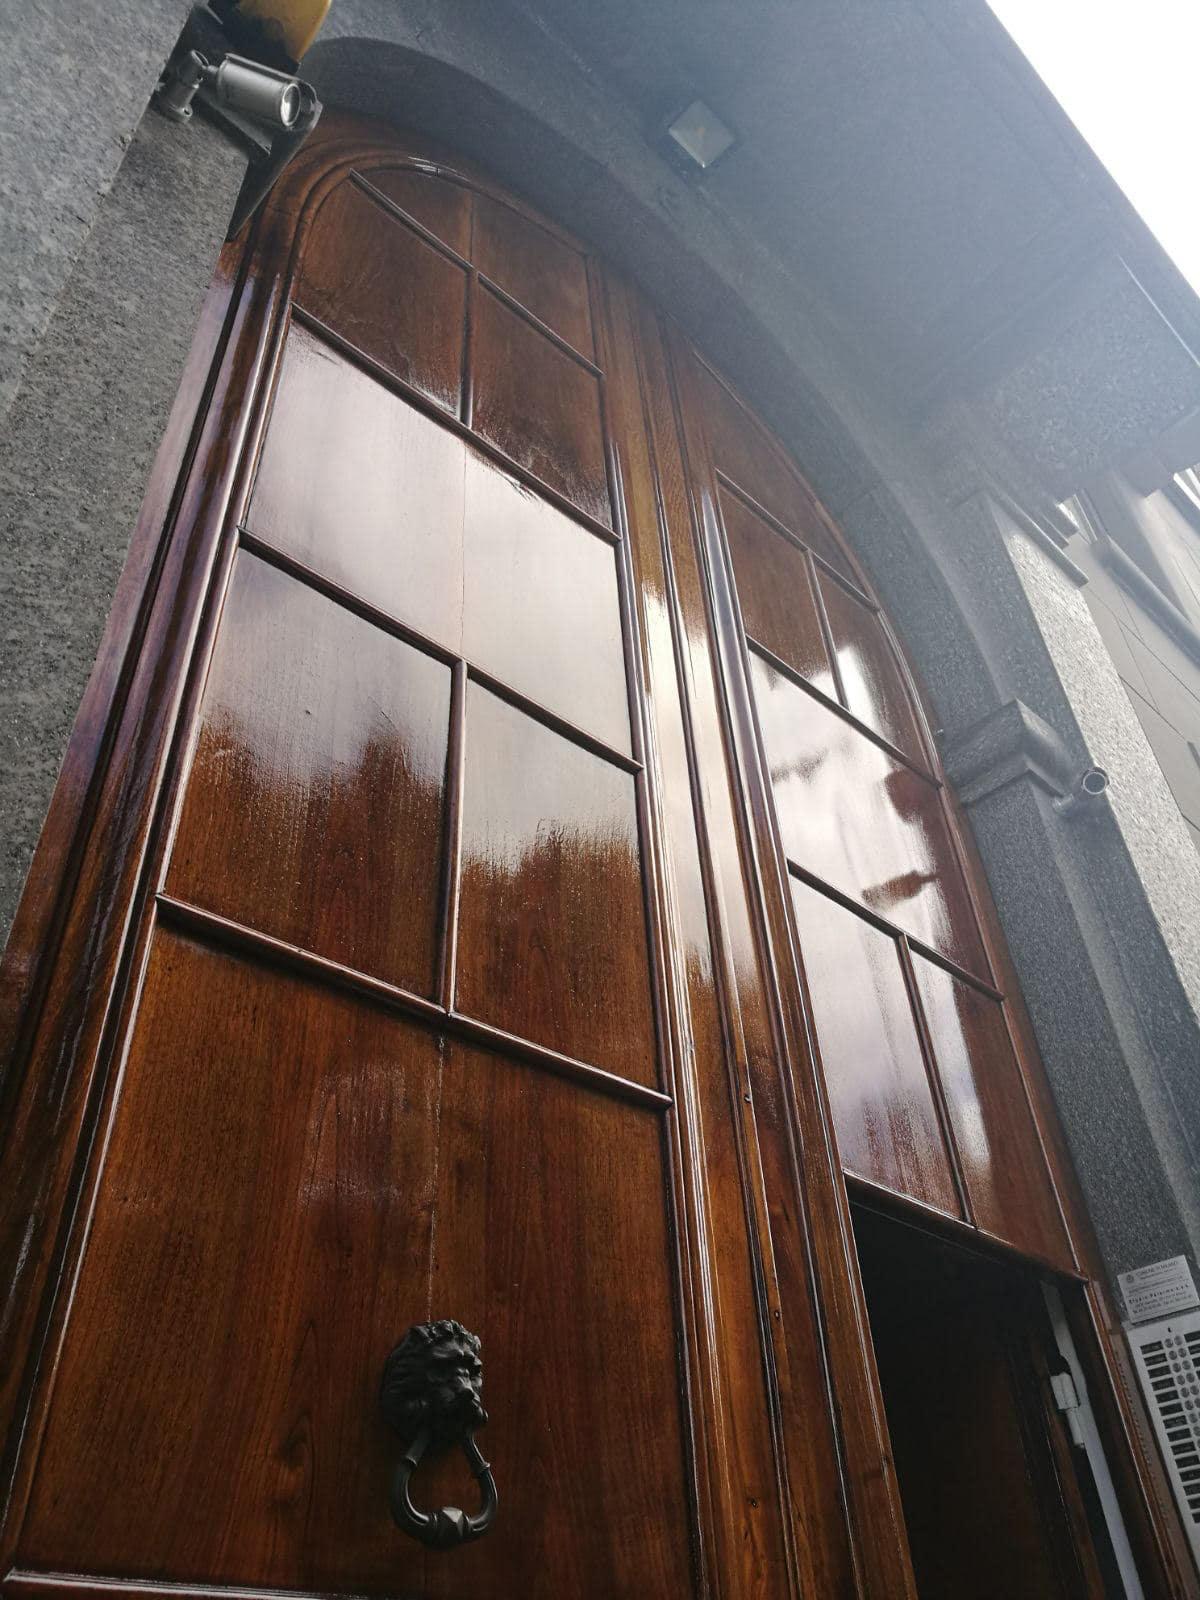 Italian doors restored with Deks Olje D1 & D2 | Owatrol Direct